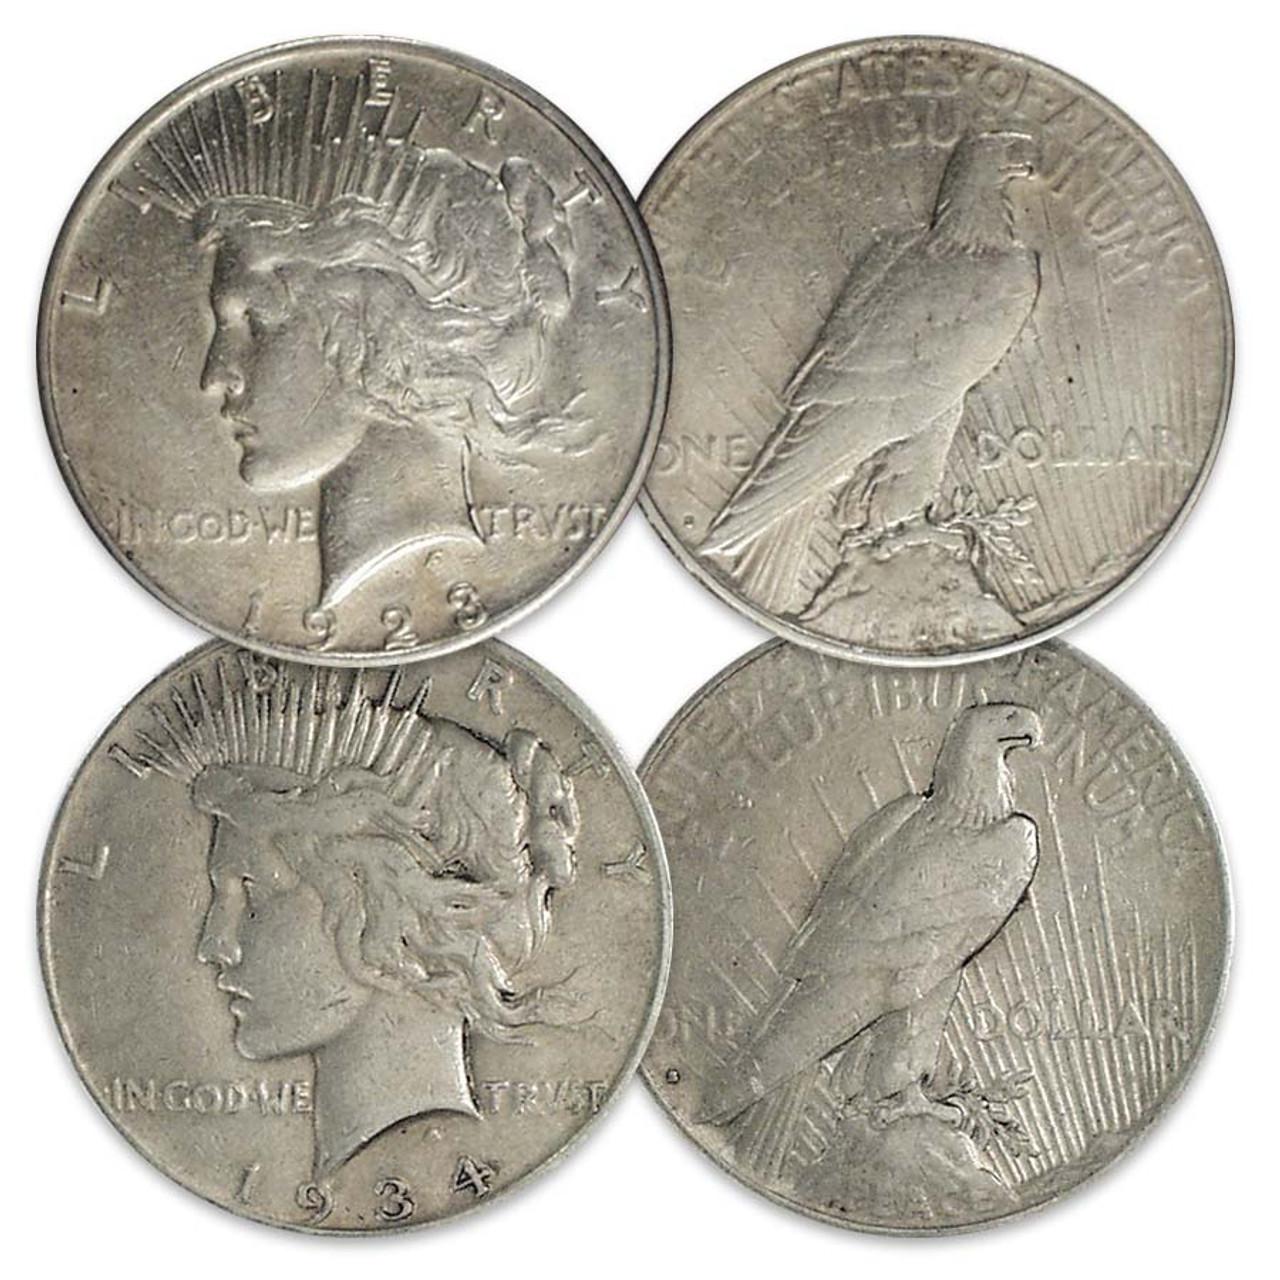 1923-S & 1934-S Peace Silver Dollar Pair Very Fine